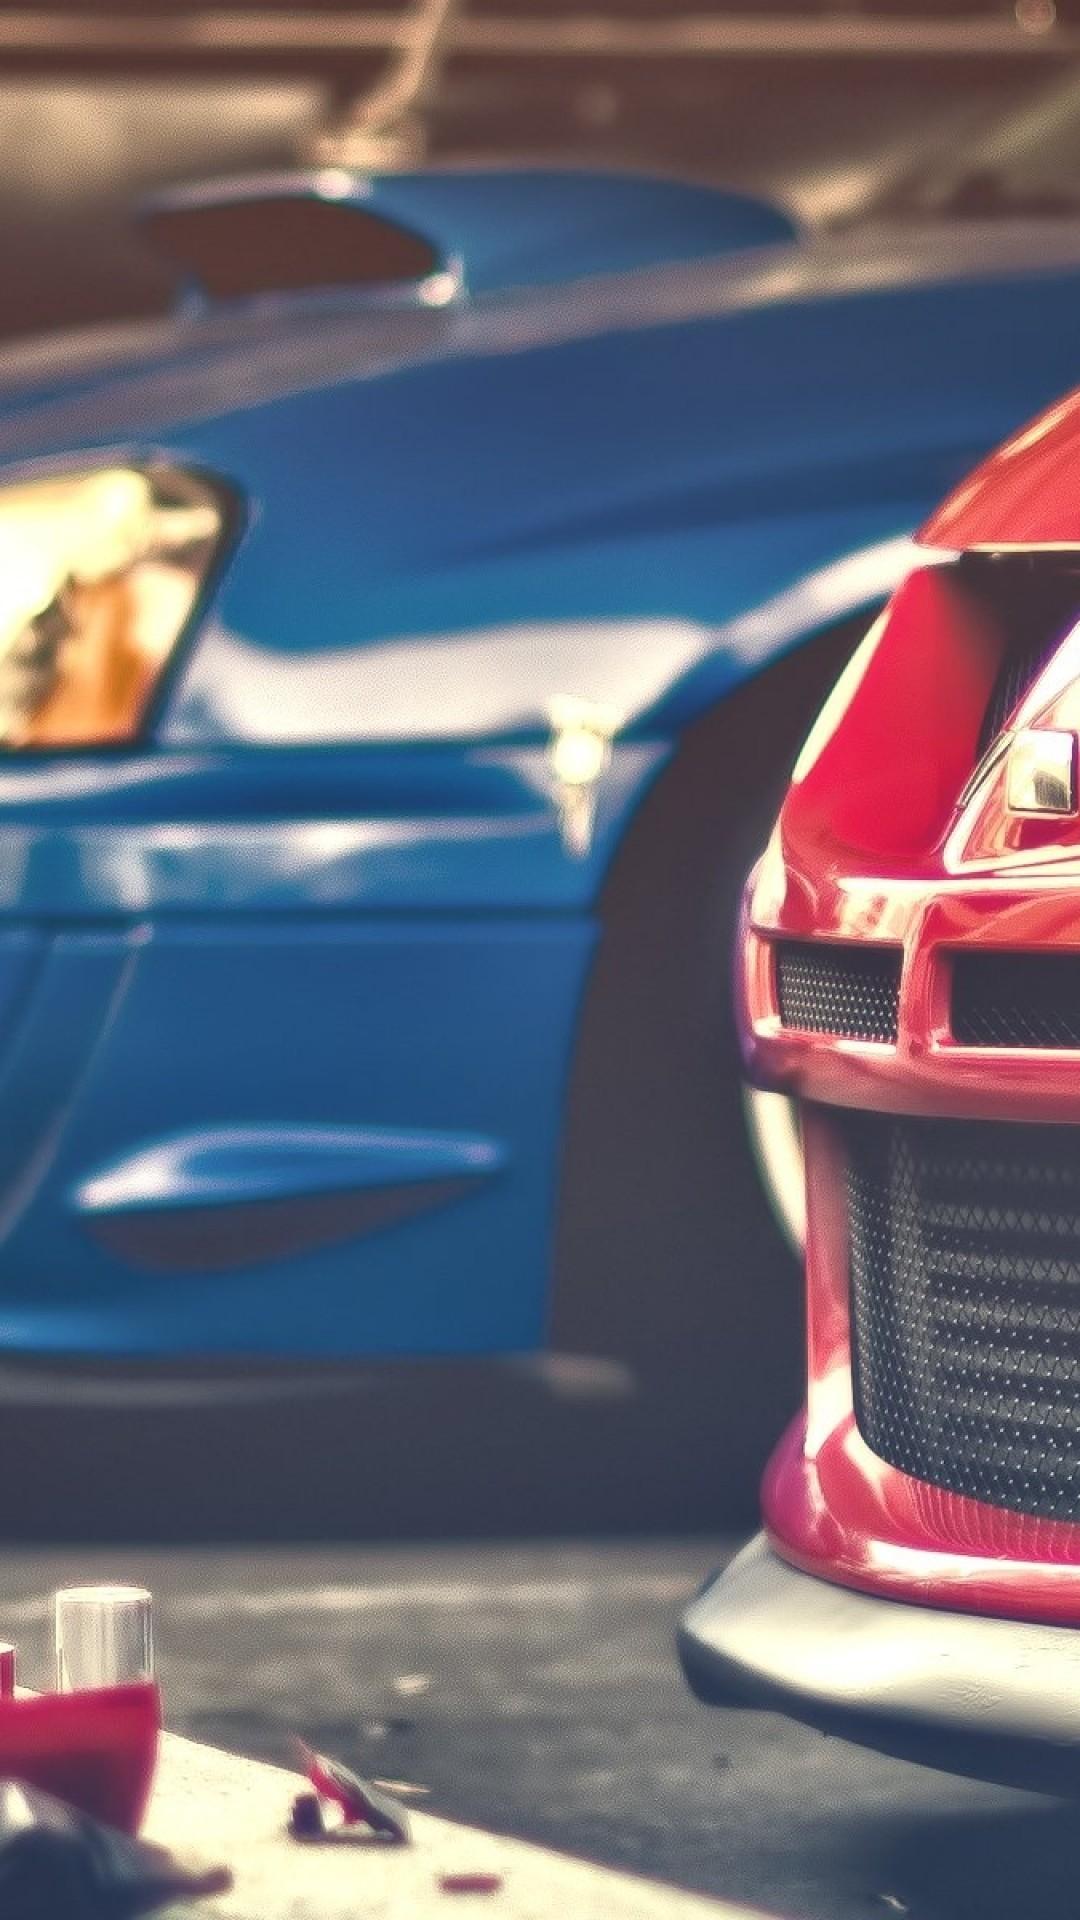 Mitsubishi Lancer Evolution, Subaru Wrx Sti, Front View, Racing, Cars